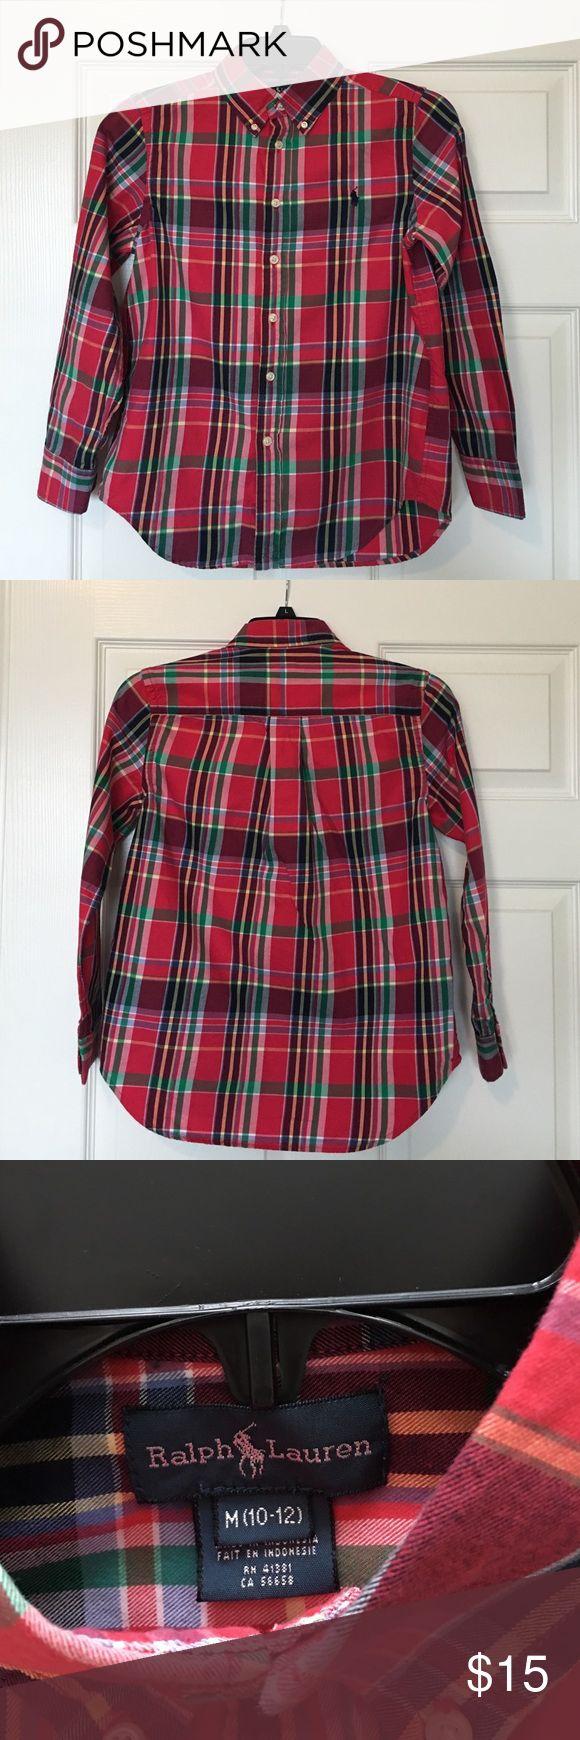 Ralph Lauren Red Plaid Shirt (10-12) Great condition. Ralph Lauren Shirts & Tops Button Down Shirts